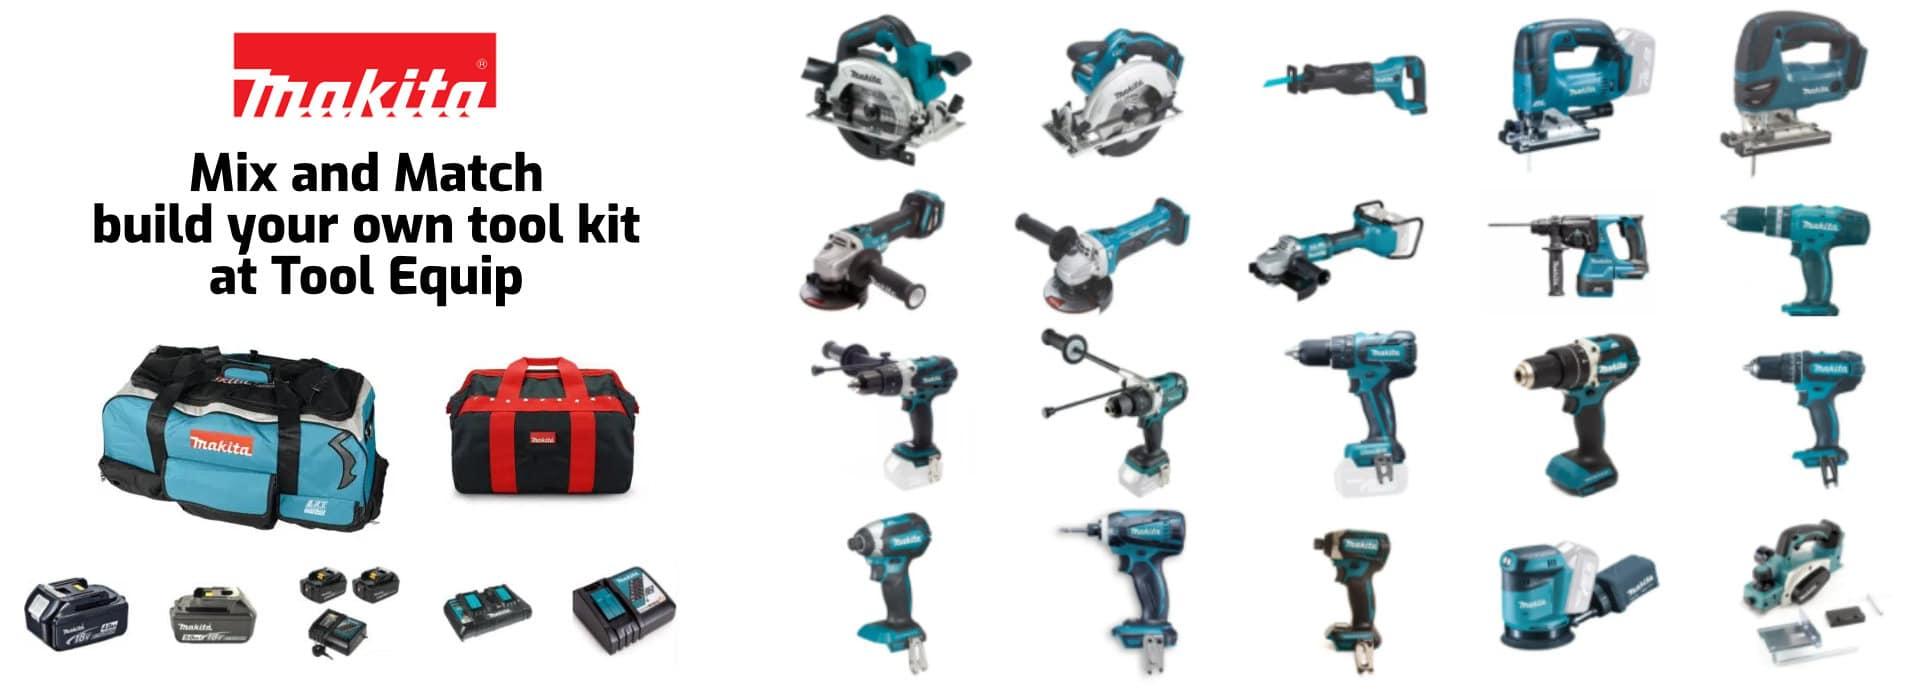 build your own makita tool kit